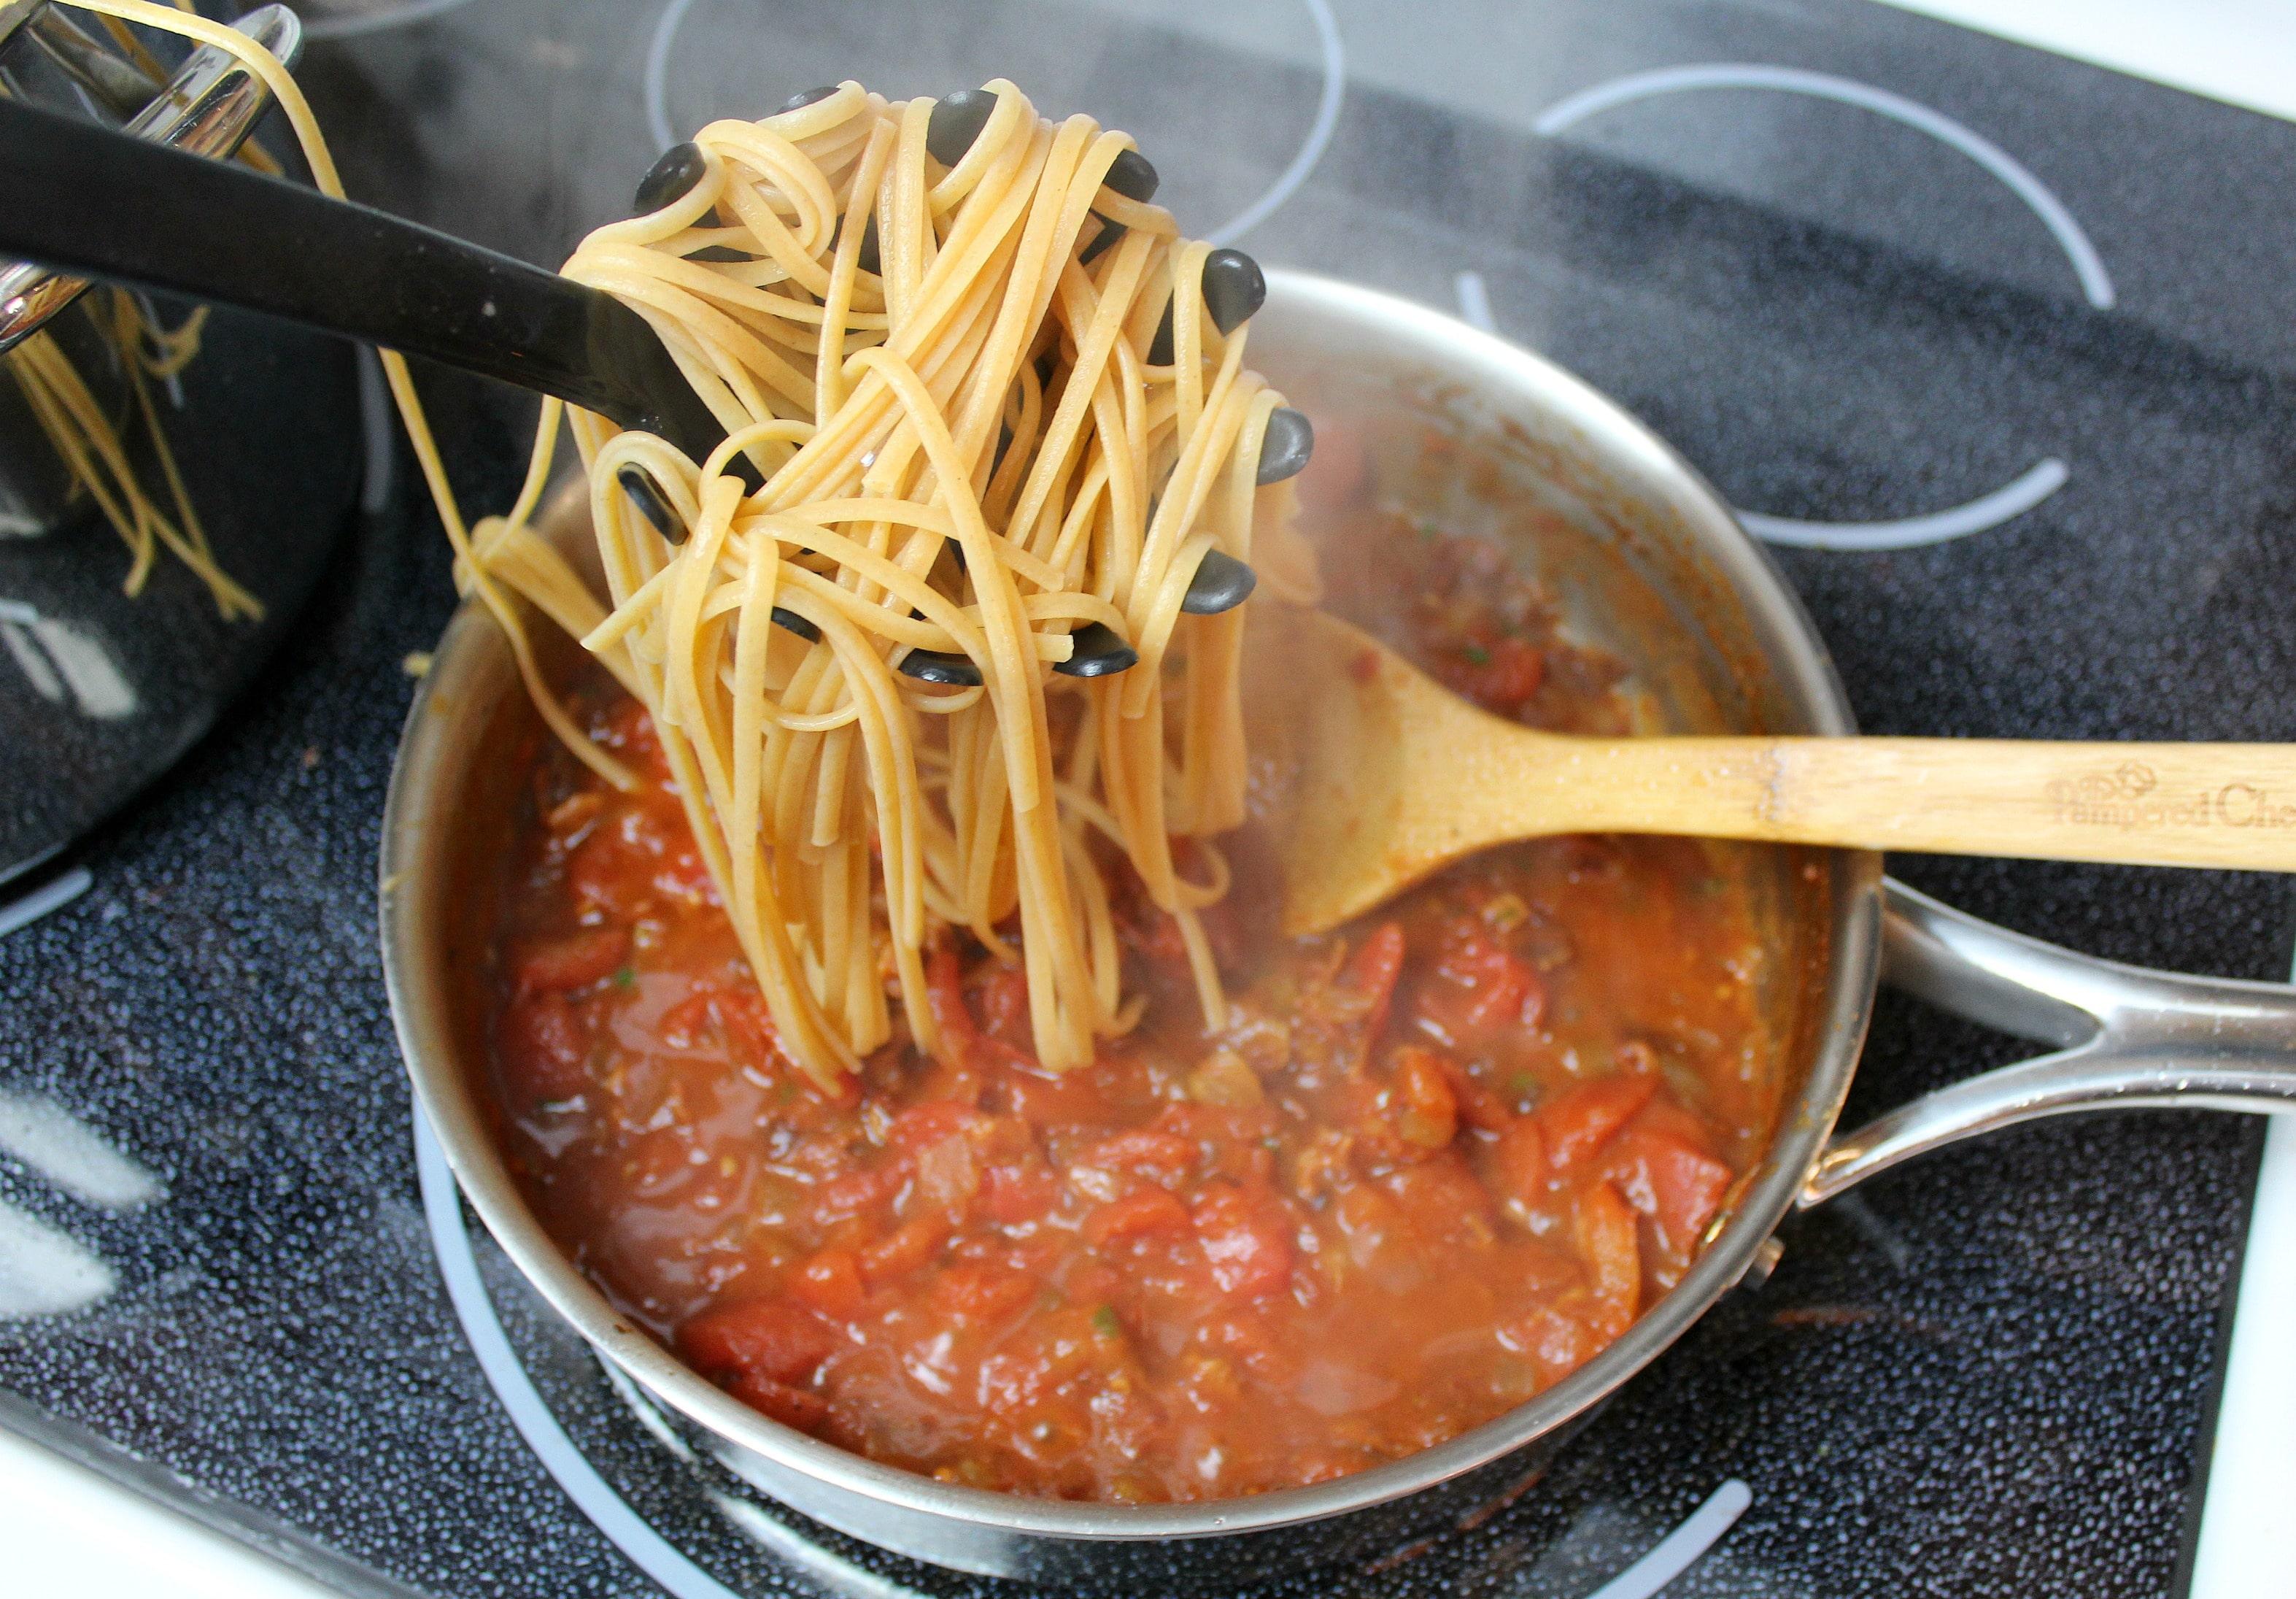 Add pasta to tomato sauce